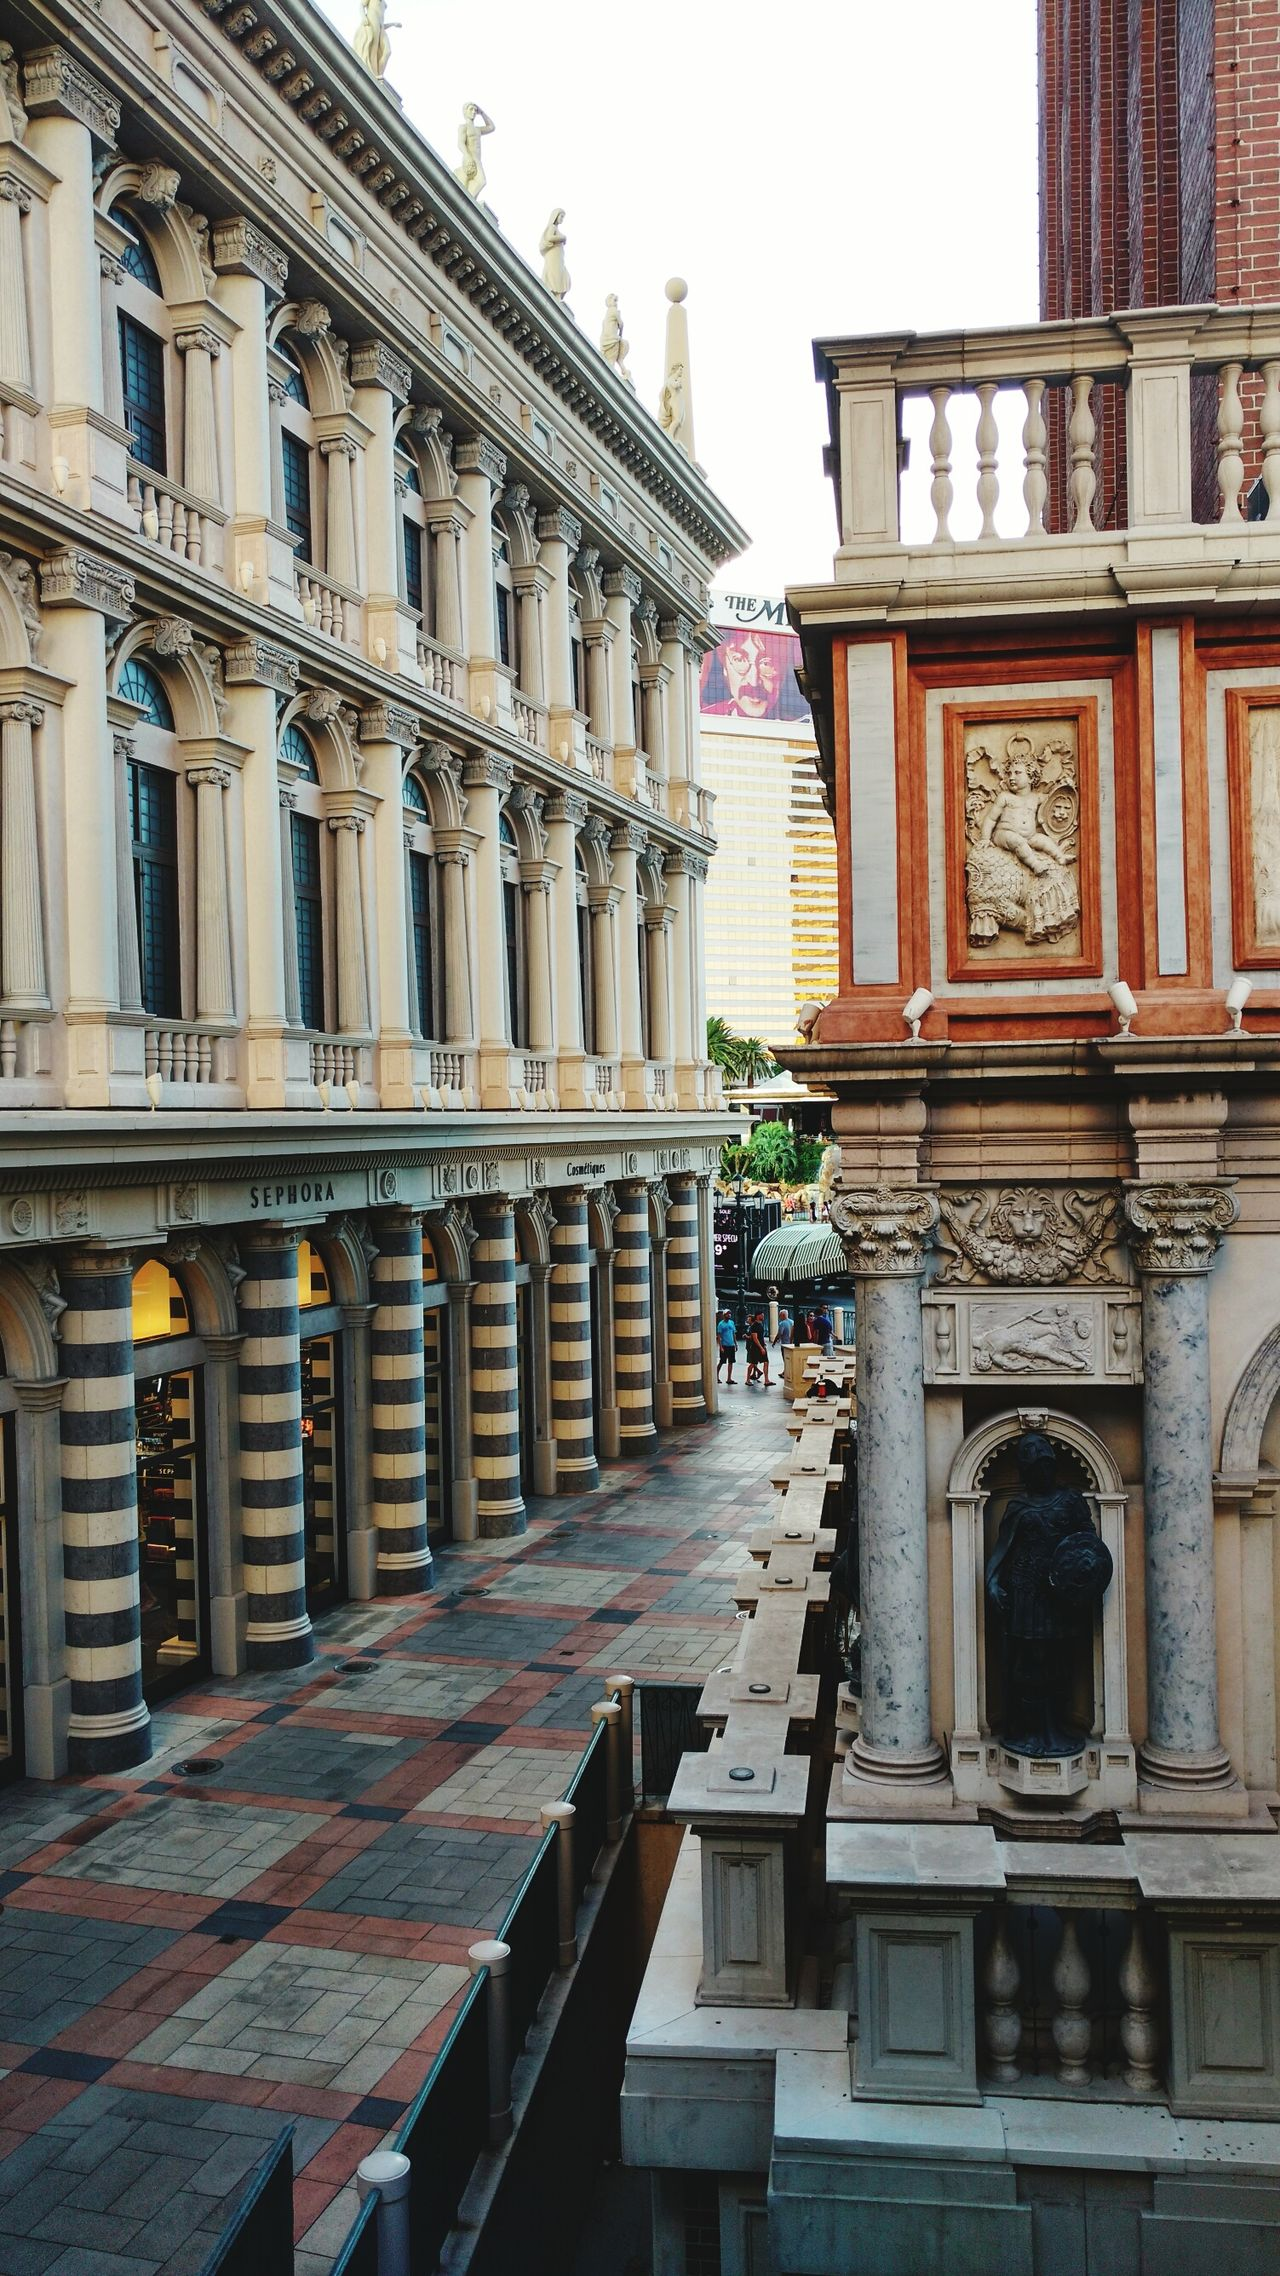 Beautiful stock photos of las vegas, building exterior, architecture, built structure, travel destinations